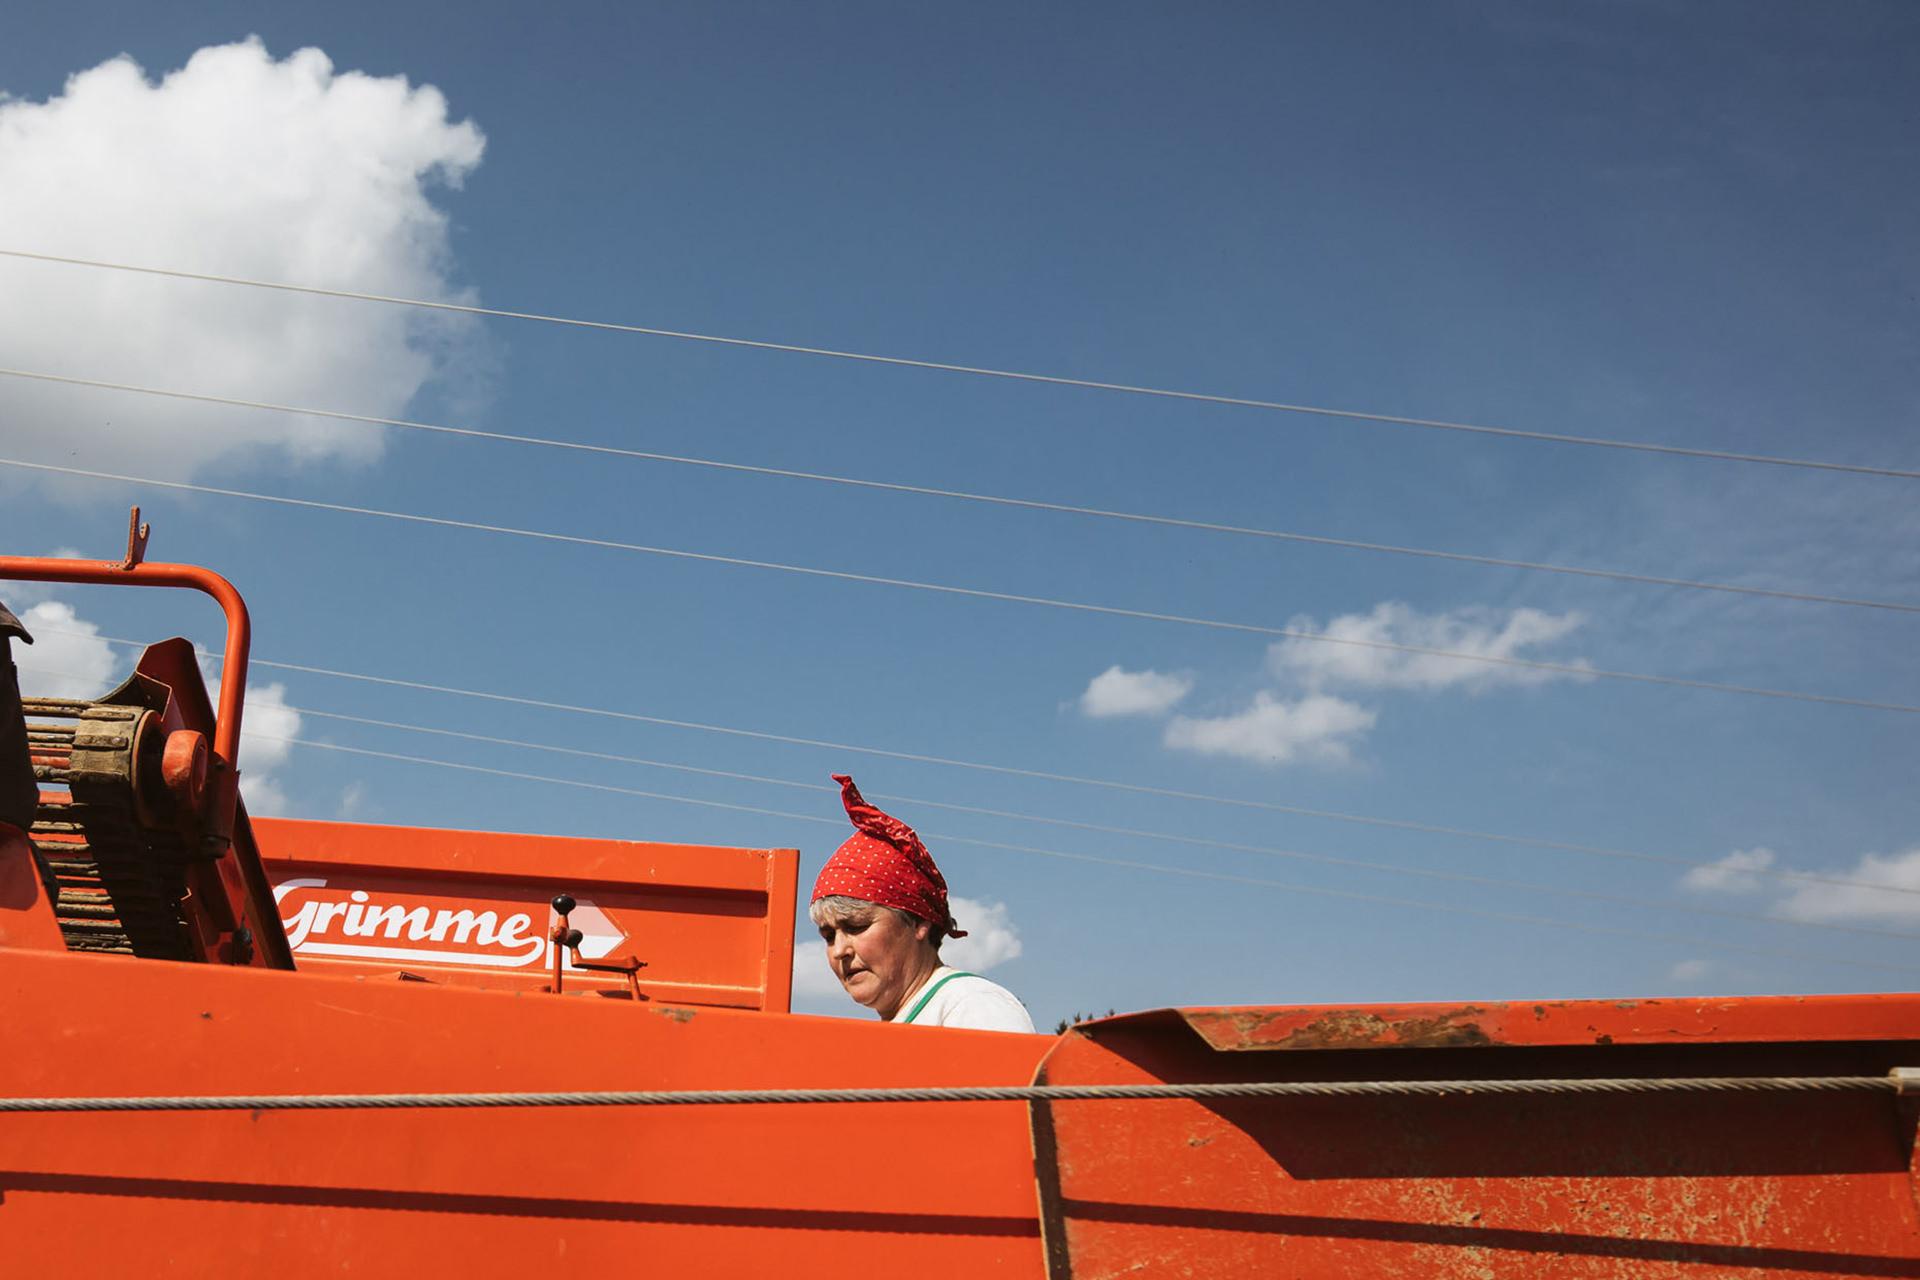 landwirtschaft-maschine-naturland-kampange